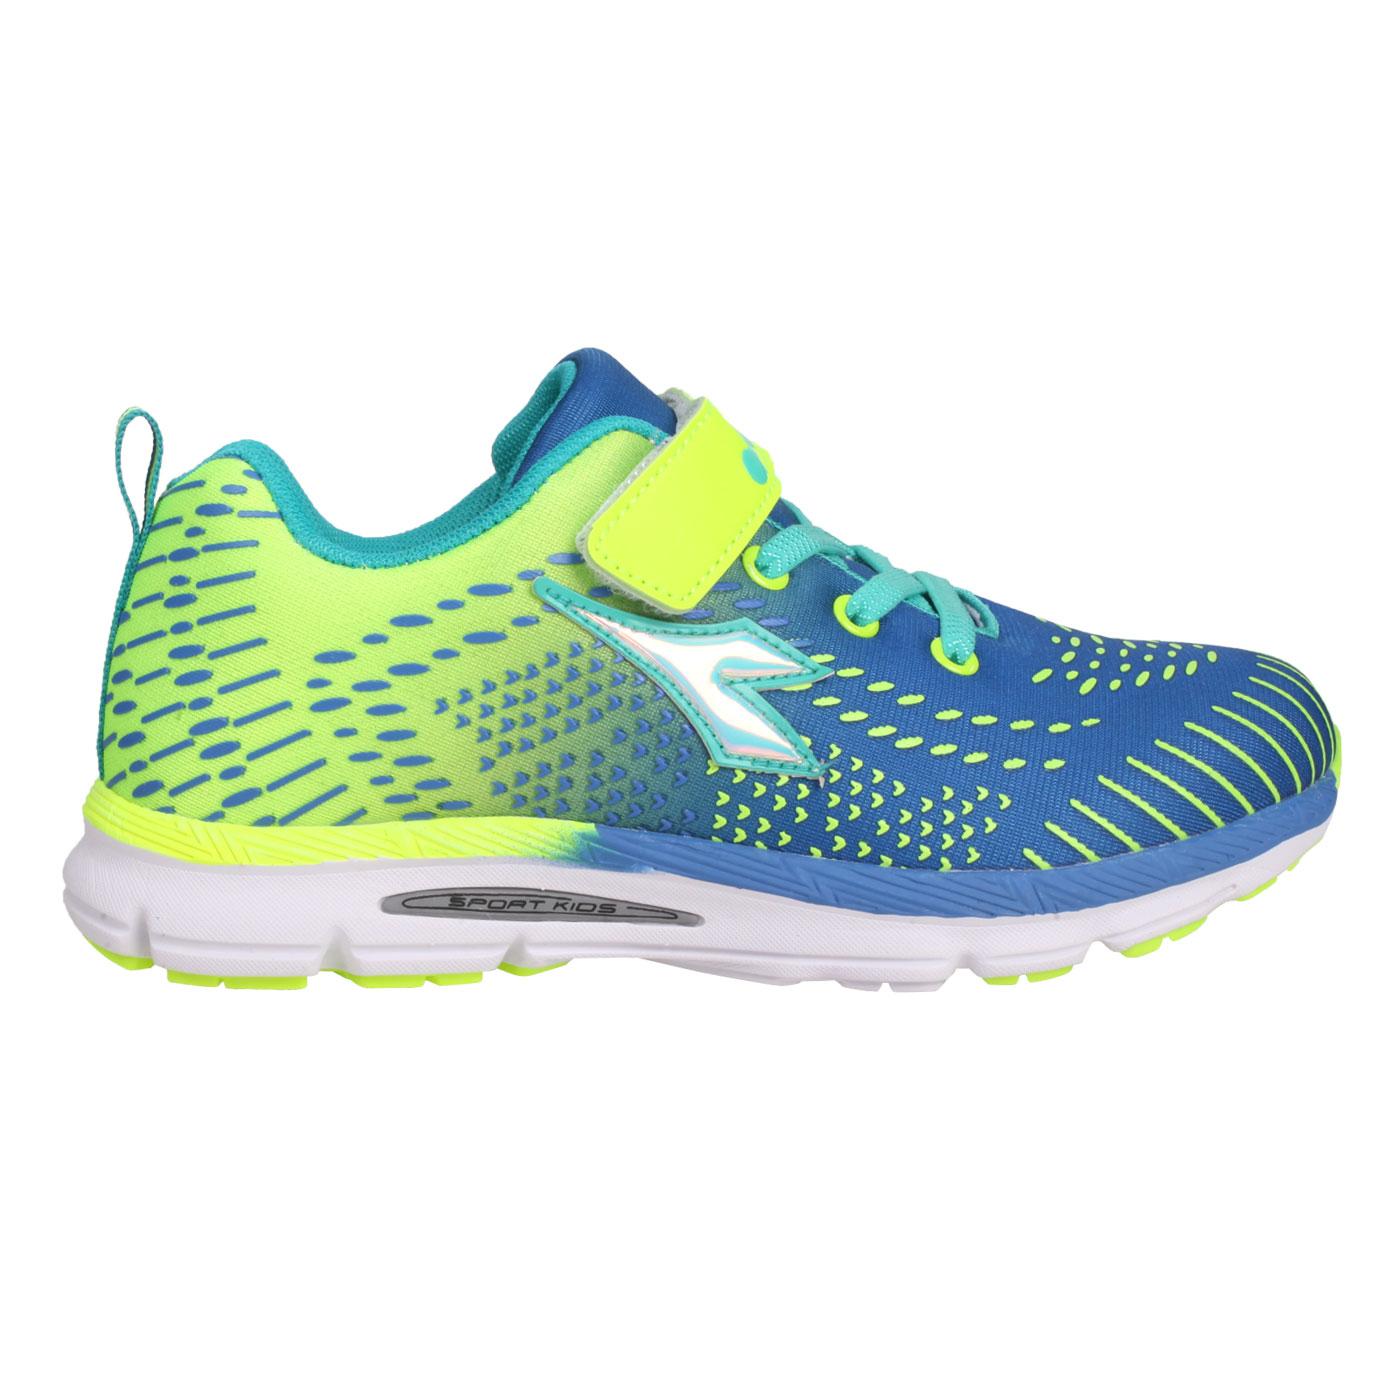 DIADORA 中童慢跑鞋-超寬楦 DA9AKR7276 - 藍綠螢光黃